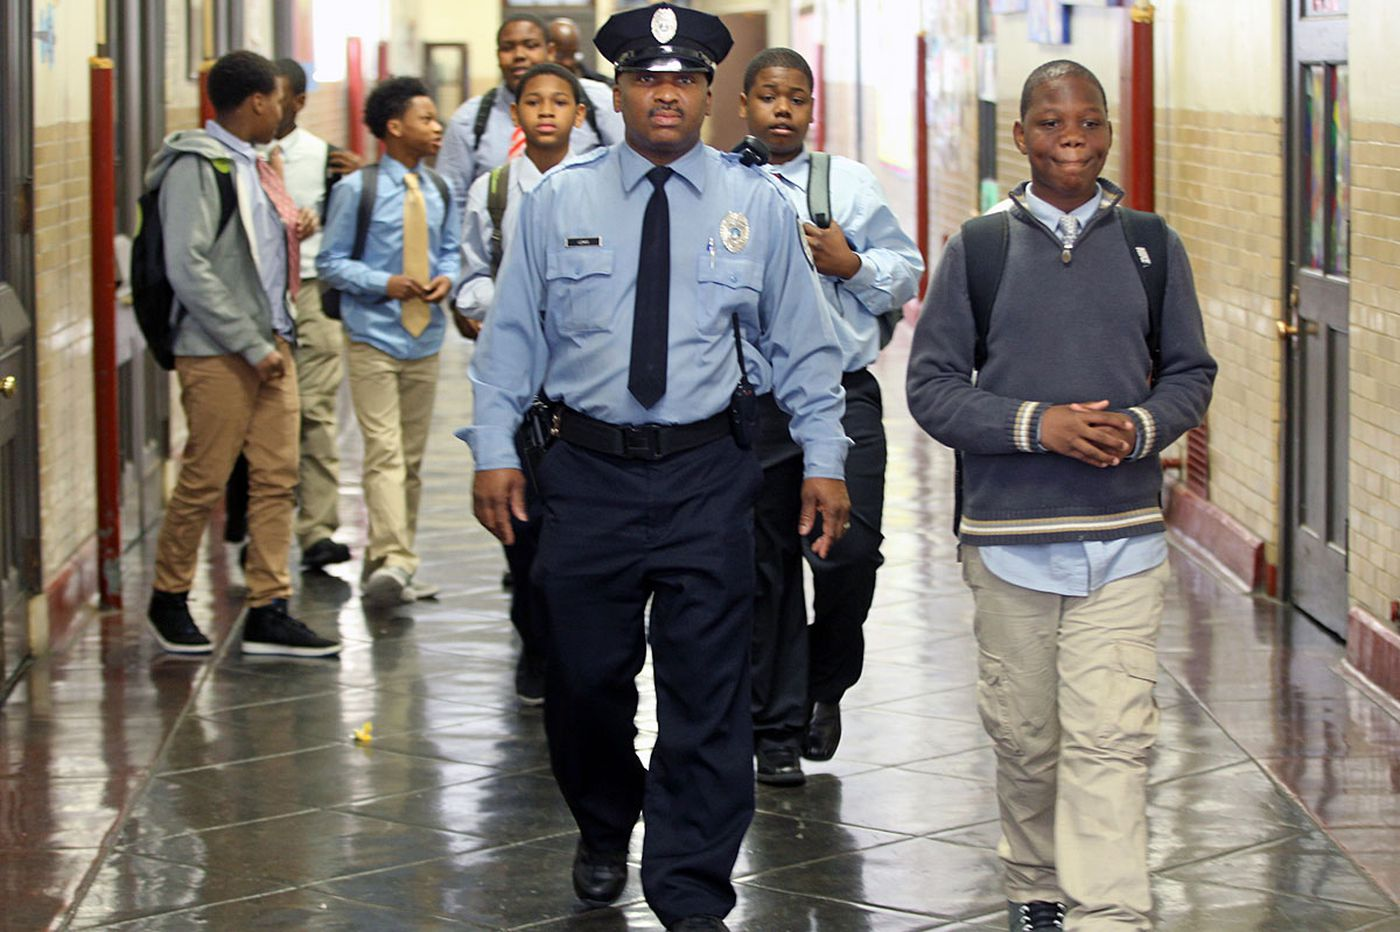 Removing school police puts unfair burden on teachers | Opinion